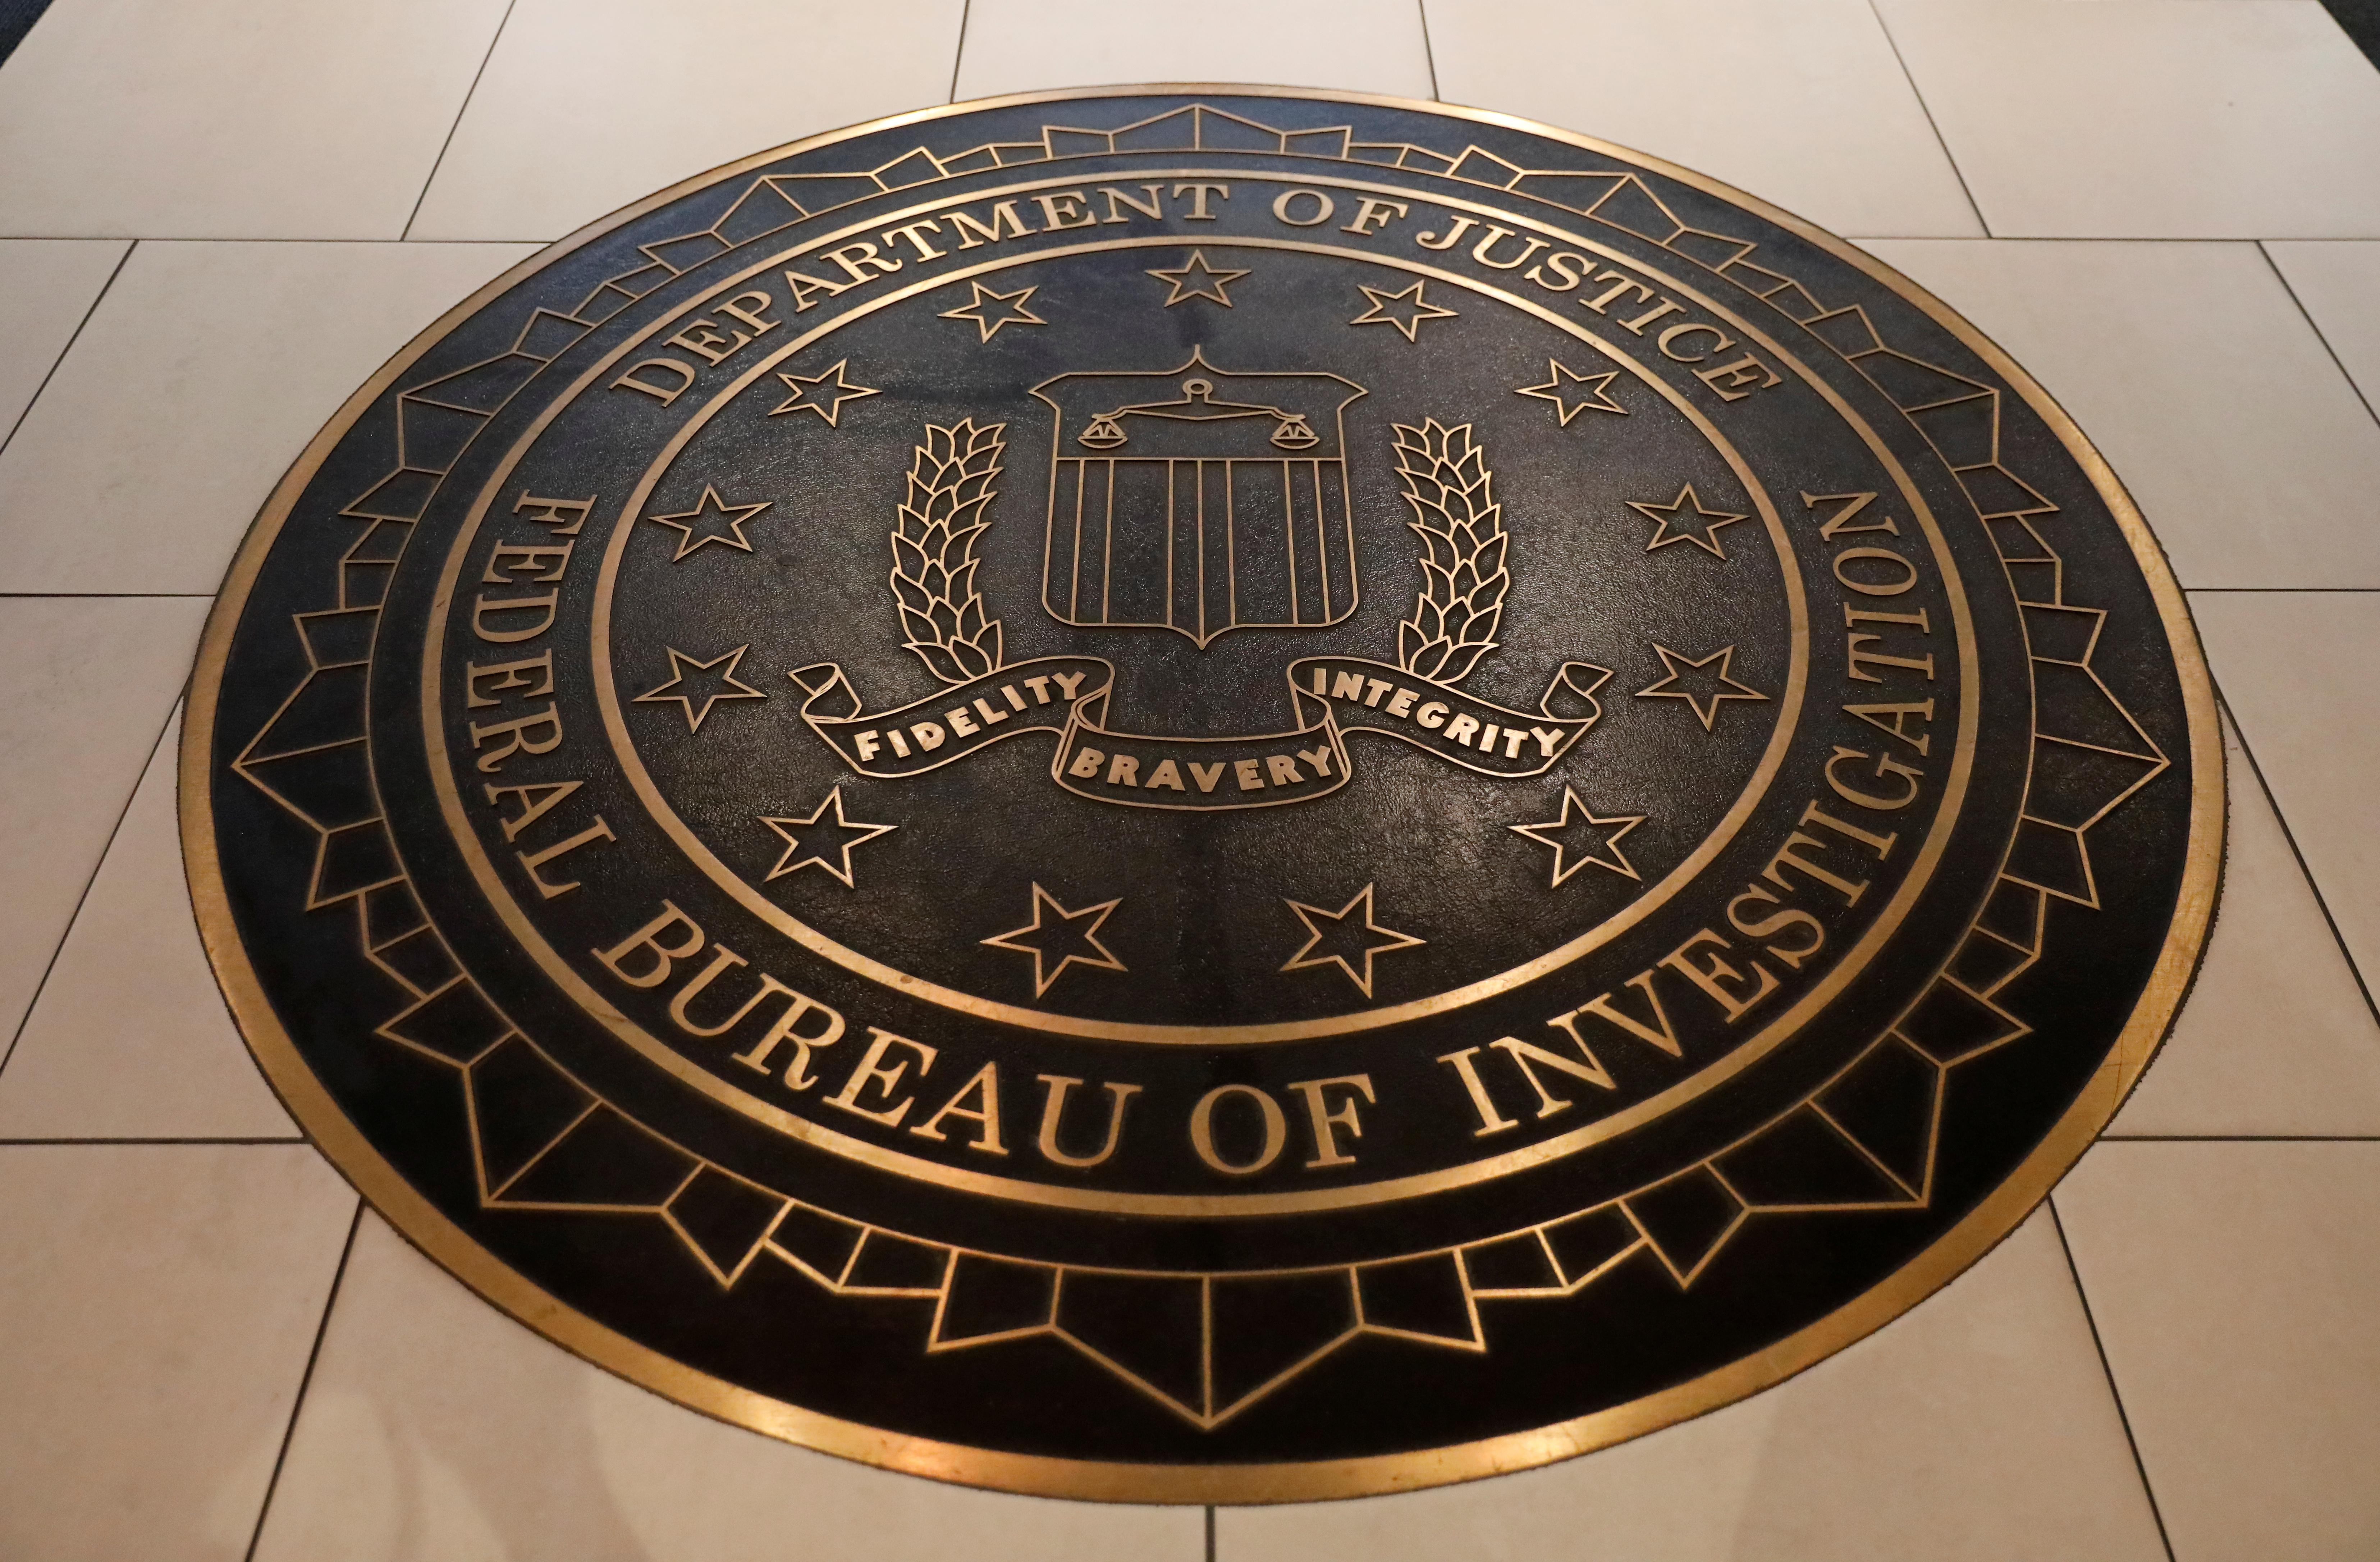 The Federal Bureau of Investigation seal at FBI headquarters in Washington, D.C. REUTERS/Yuri Gripas